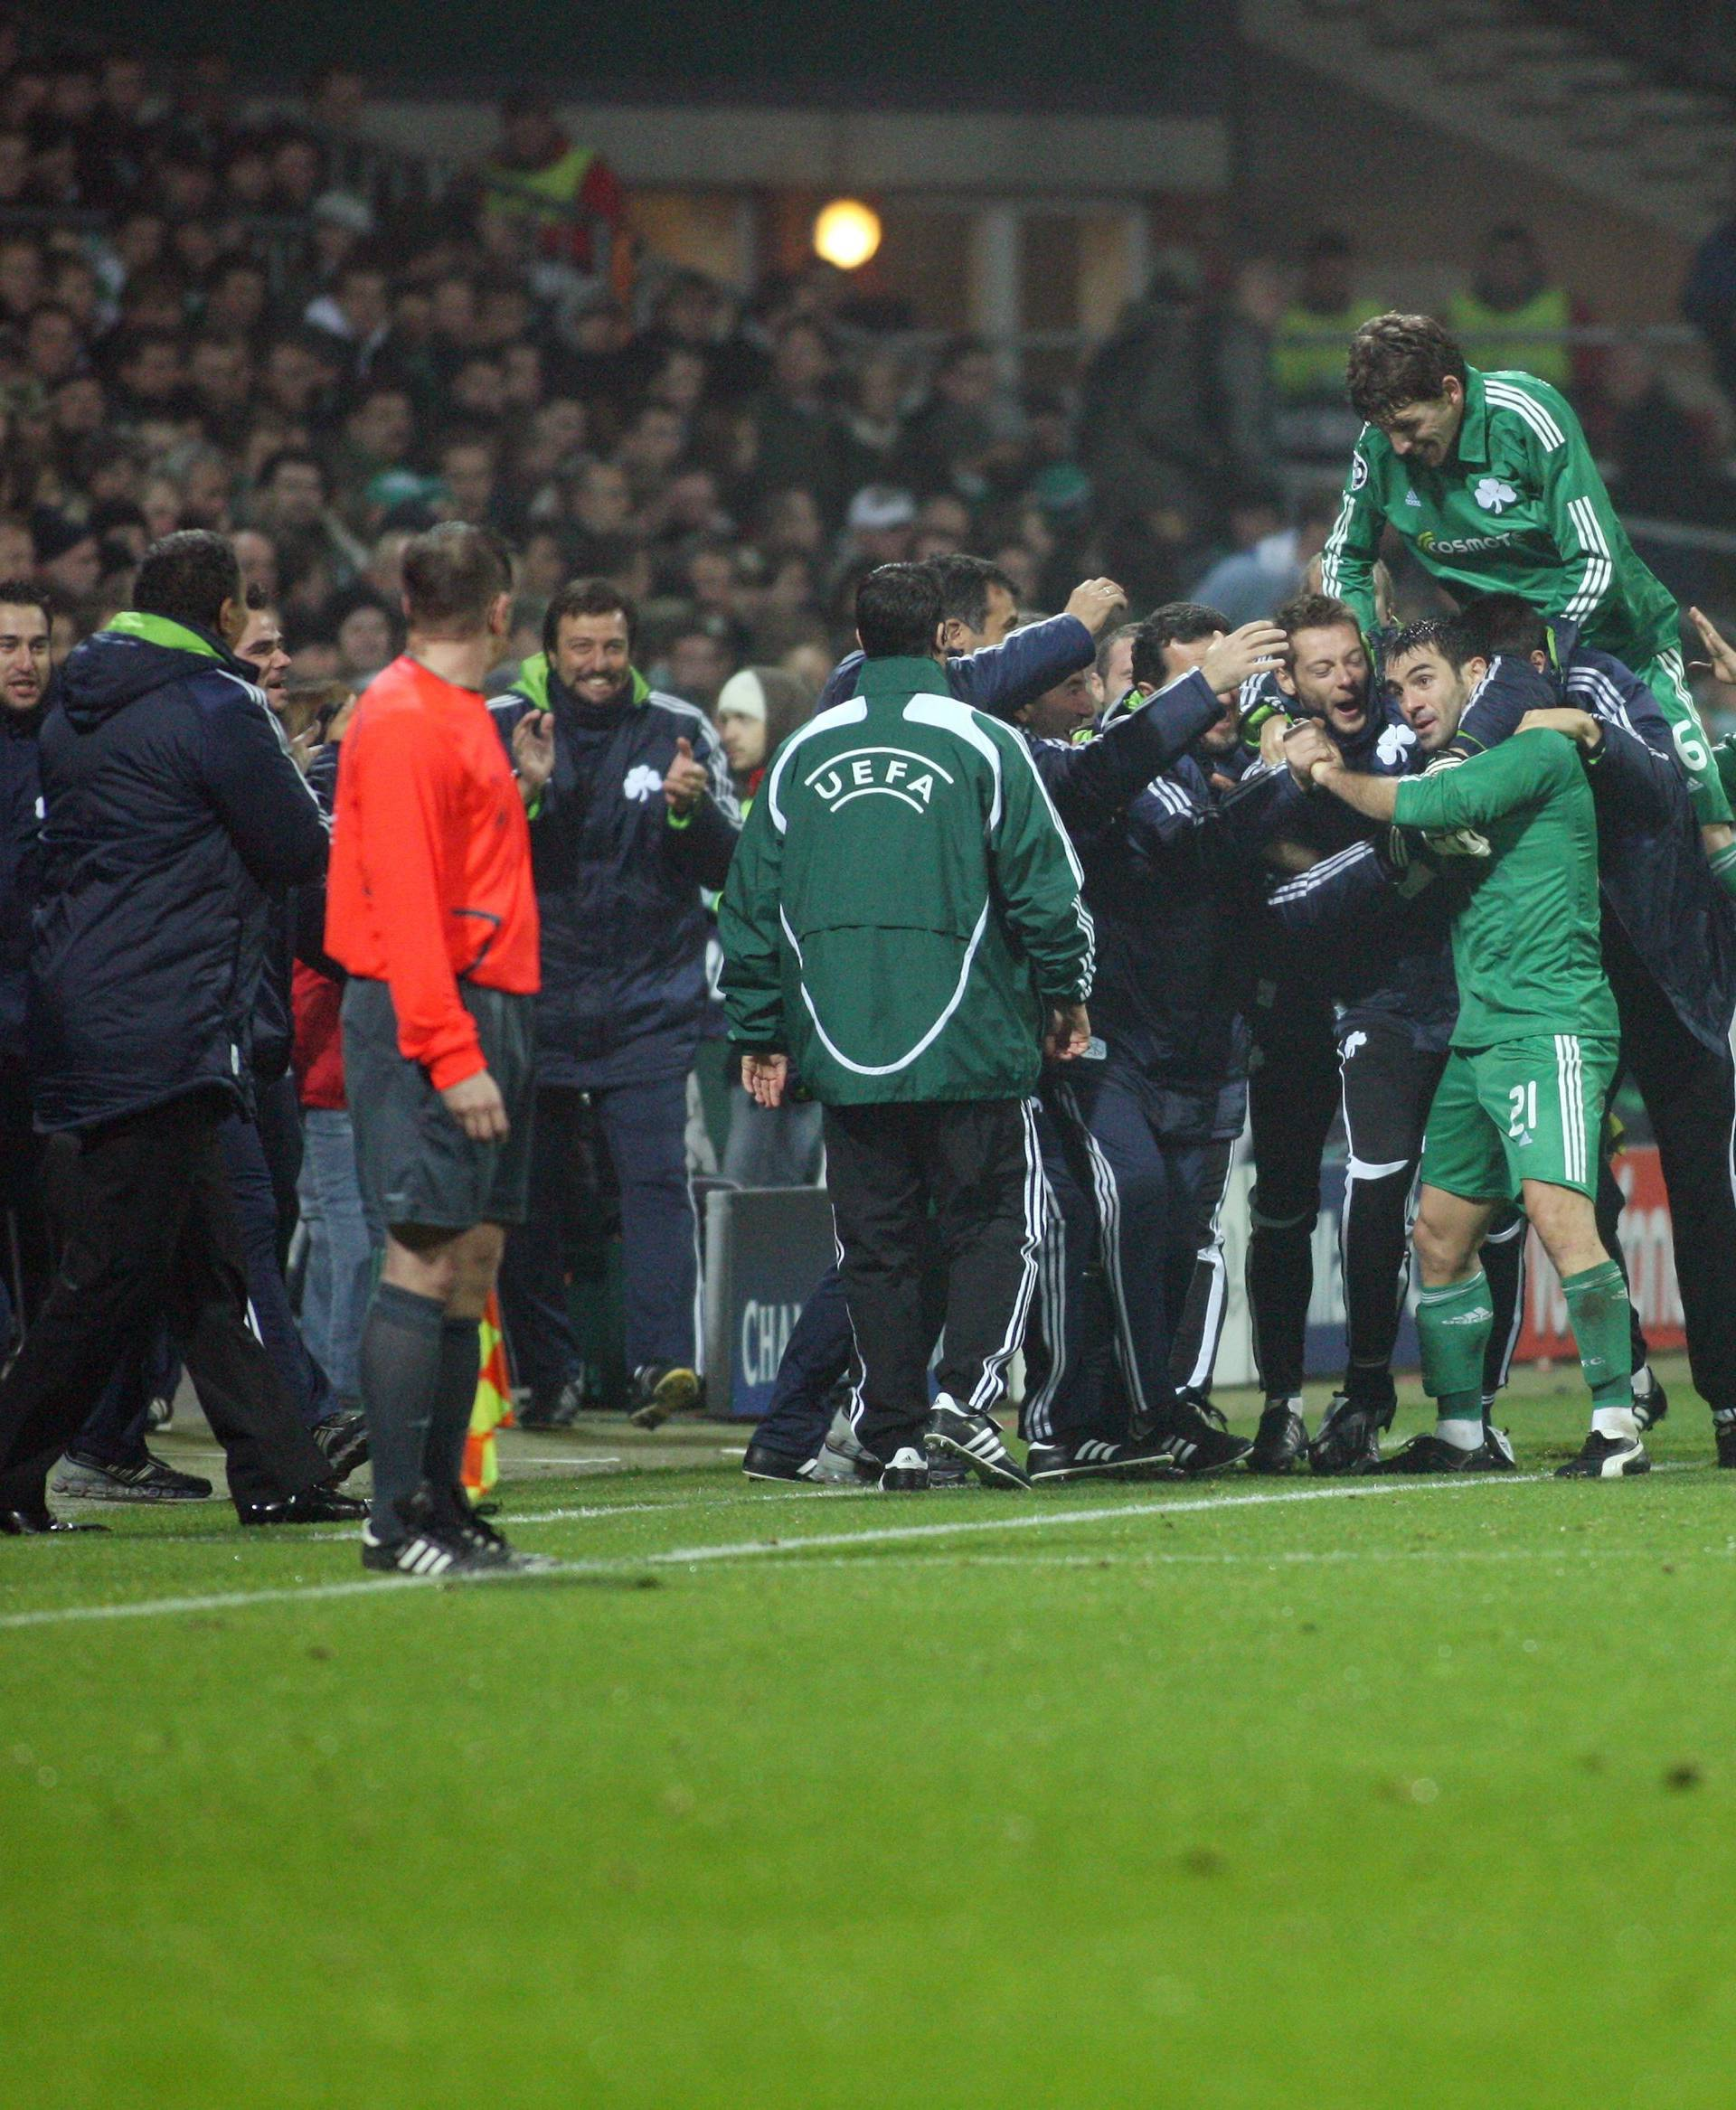 CL 08/09 Werder Bremen ( GER ) vs Panathinaikos Athen ( GRE ) 0:3